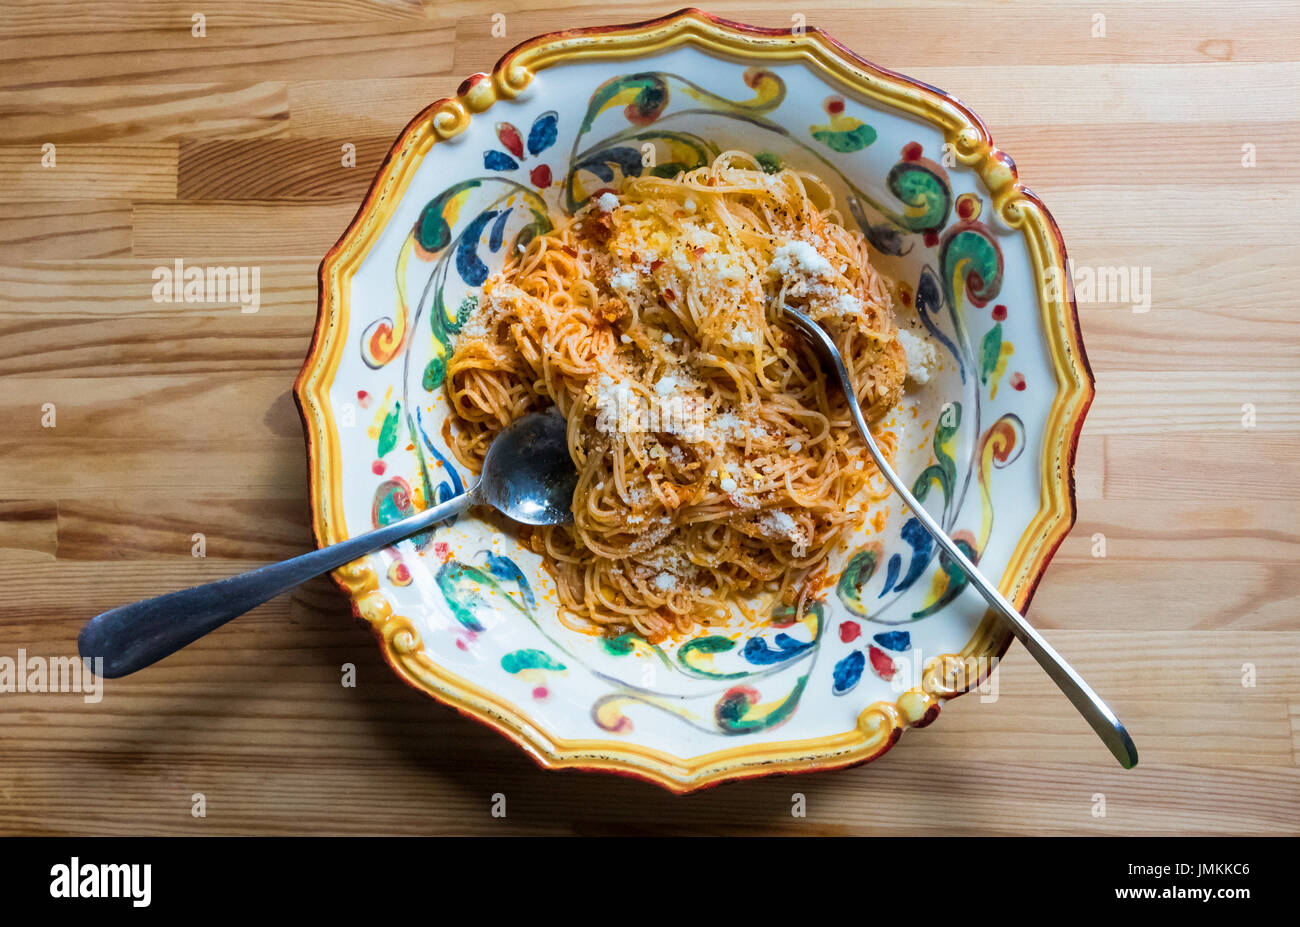 Spaghettini, o pasta fina, con tomate, cebolla, mantequilla y parmigiano reggiano (parmesano) de queso. Imagen De Stock